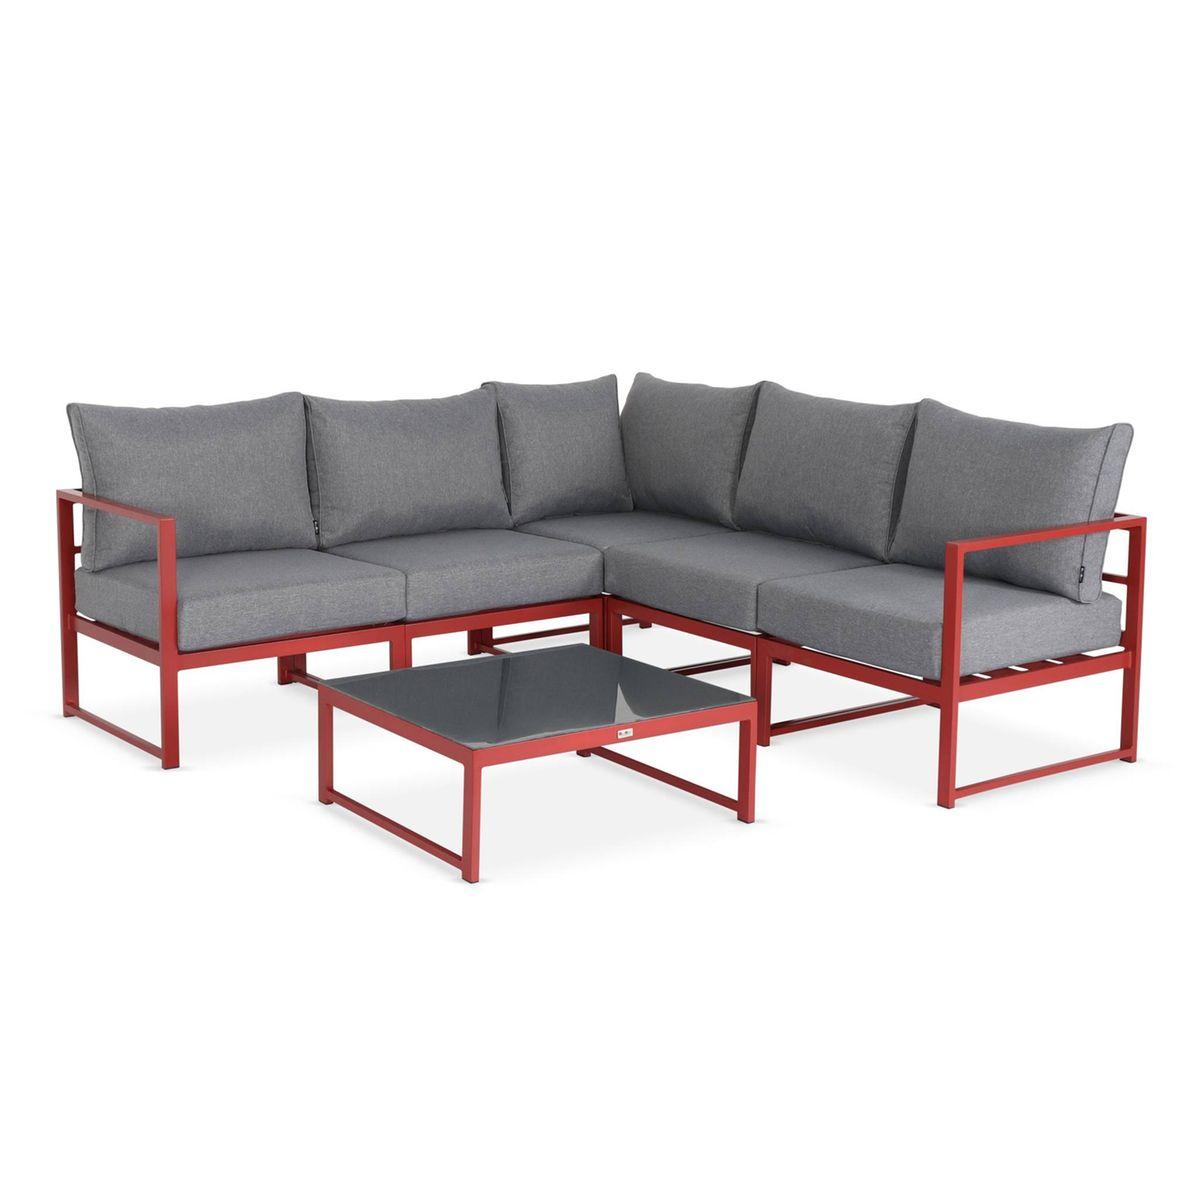 Salon De Jardin 5 Places Stratum En Aluminium Design Et Modulable